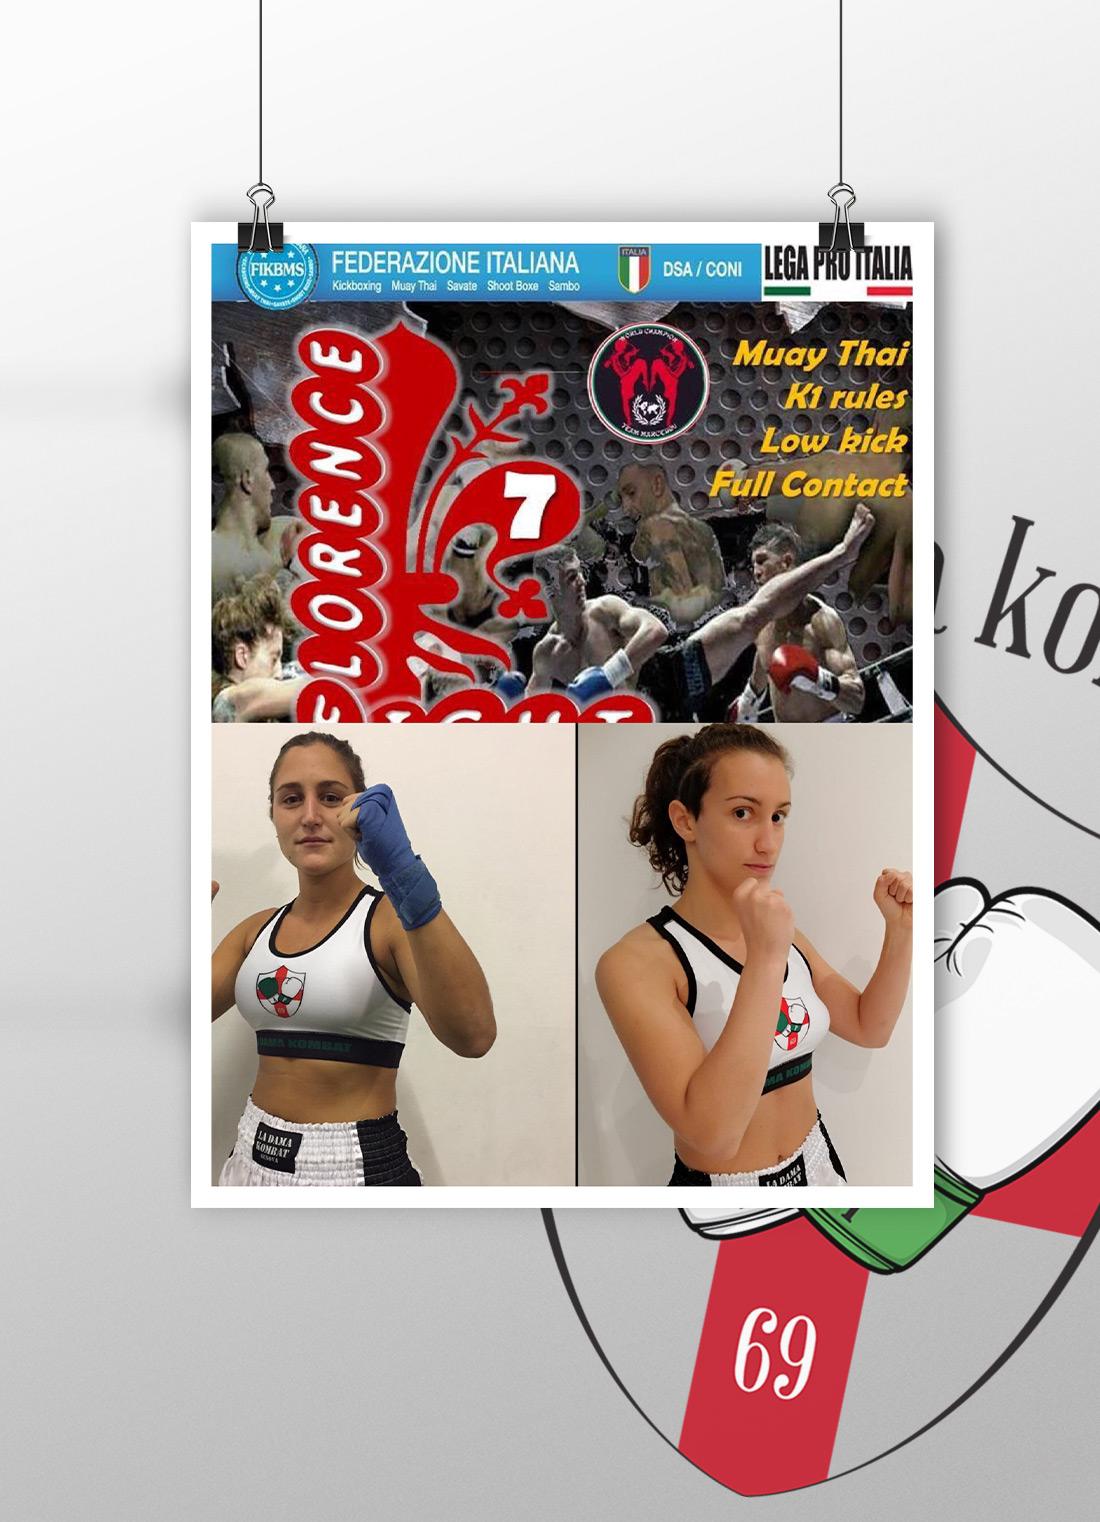 Florence fight 7-ladamakombat-savate arti marziali genova